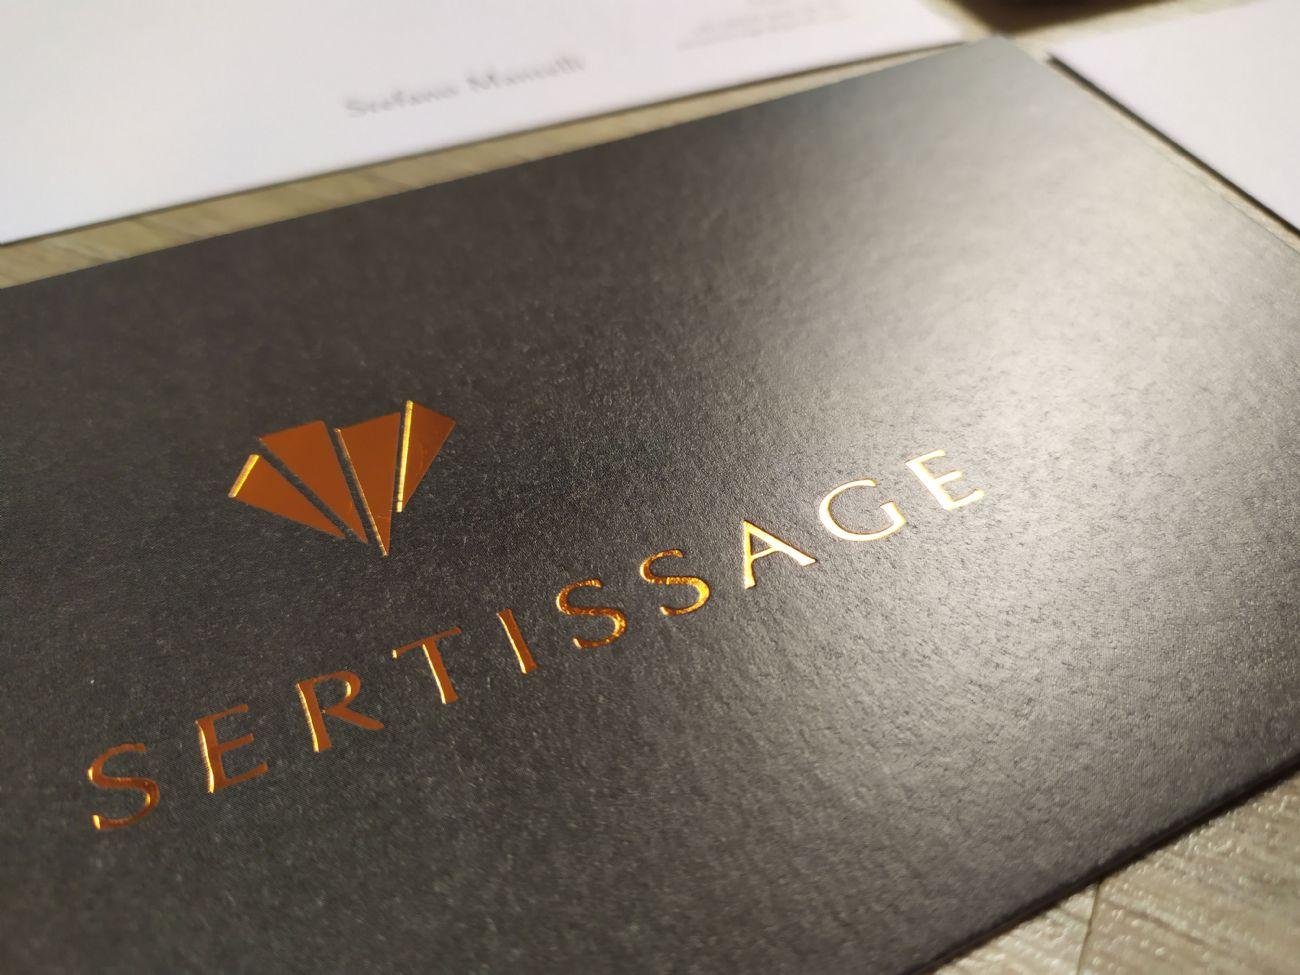 Cartoline con stampa rame a caldo